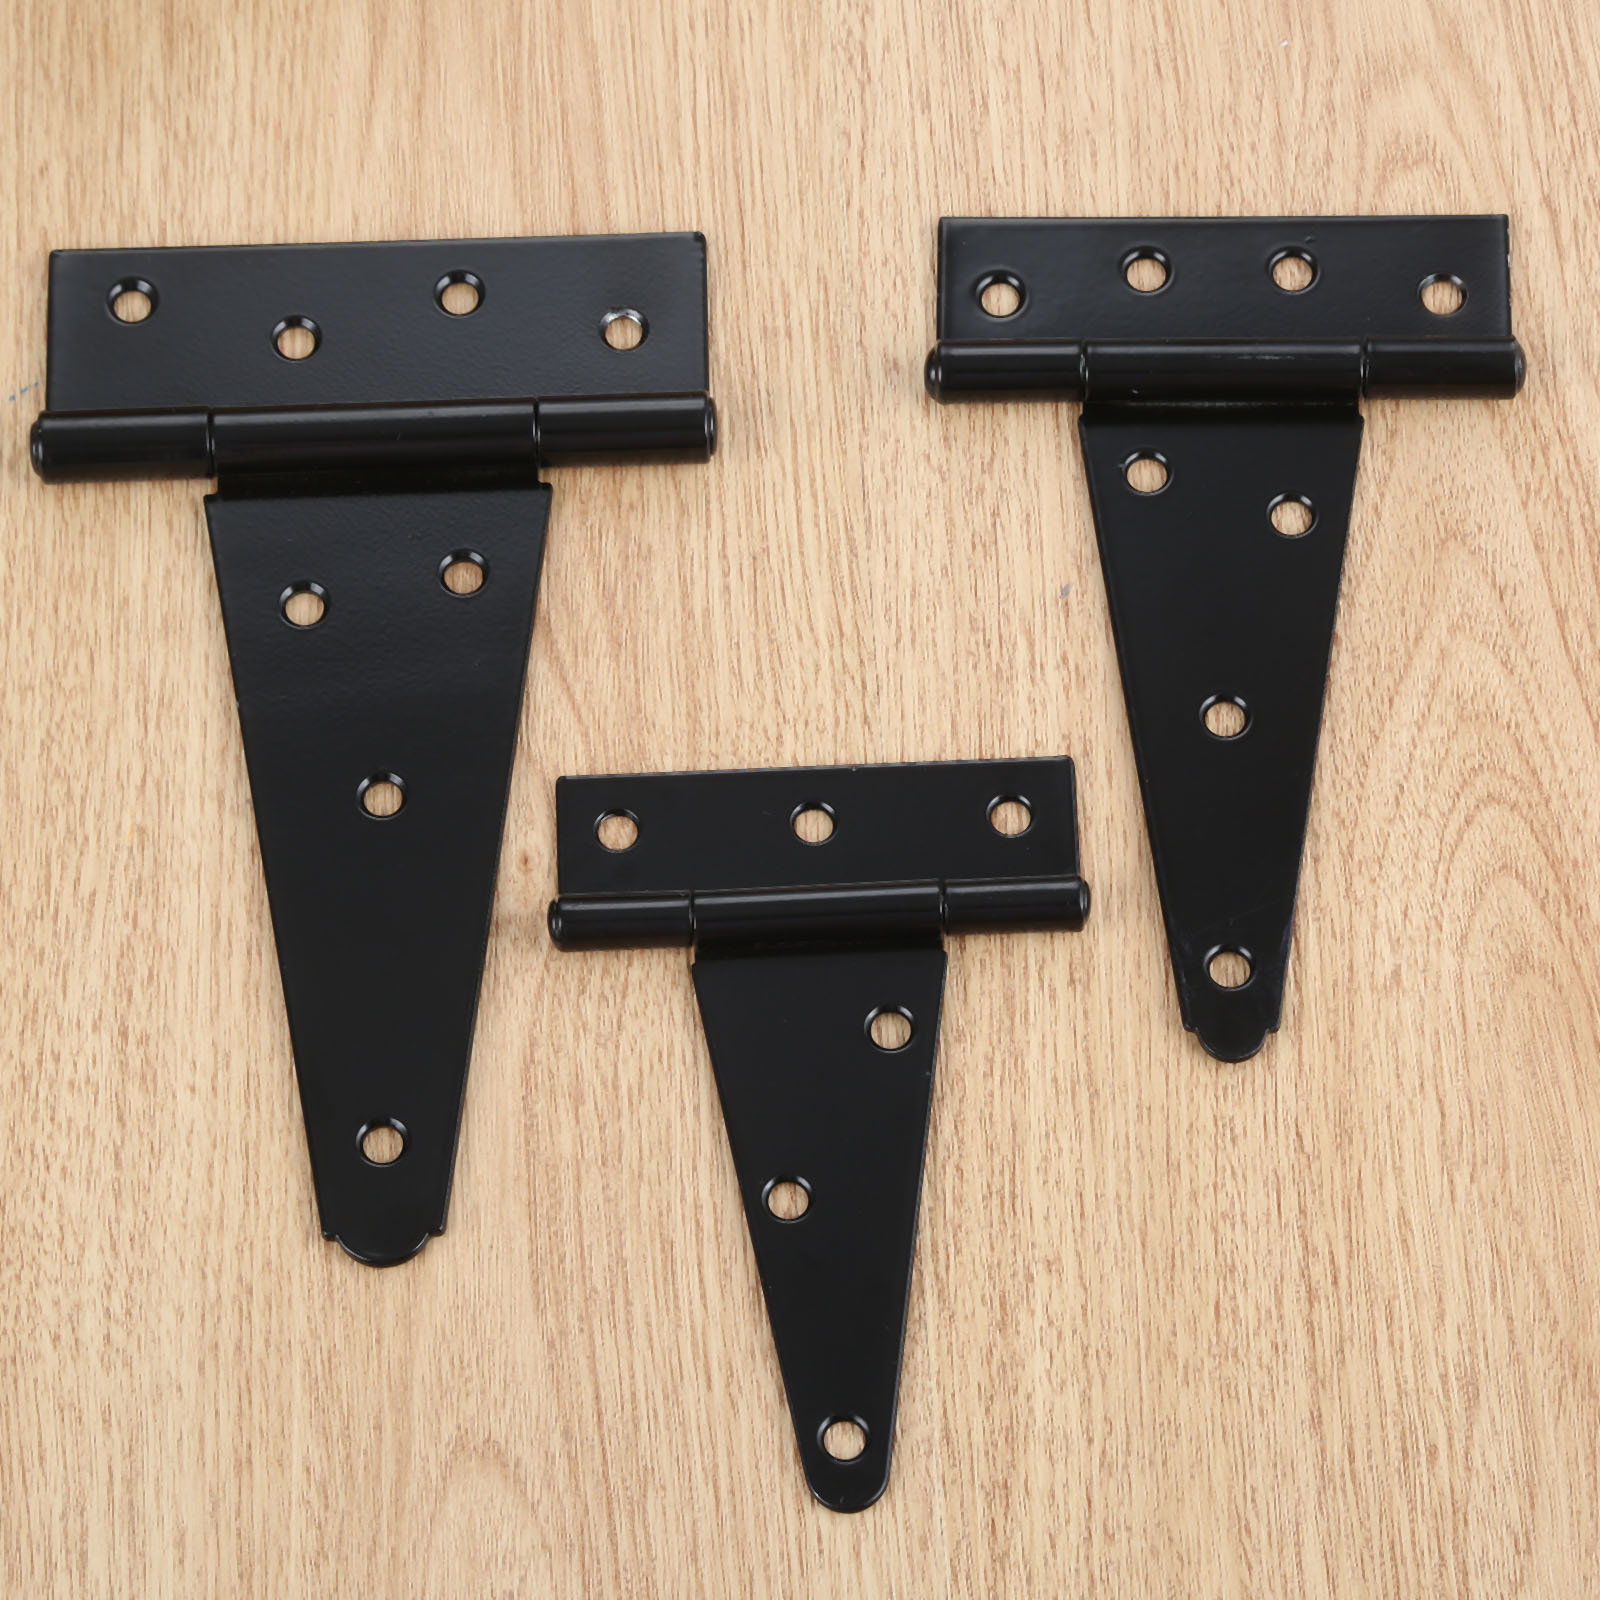 4/5/6inch Tee Hinge Wooden Box Case Industry Hinge Tool Box Wood Gate Door Heavy Thickening Hinge Furniture Hardware